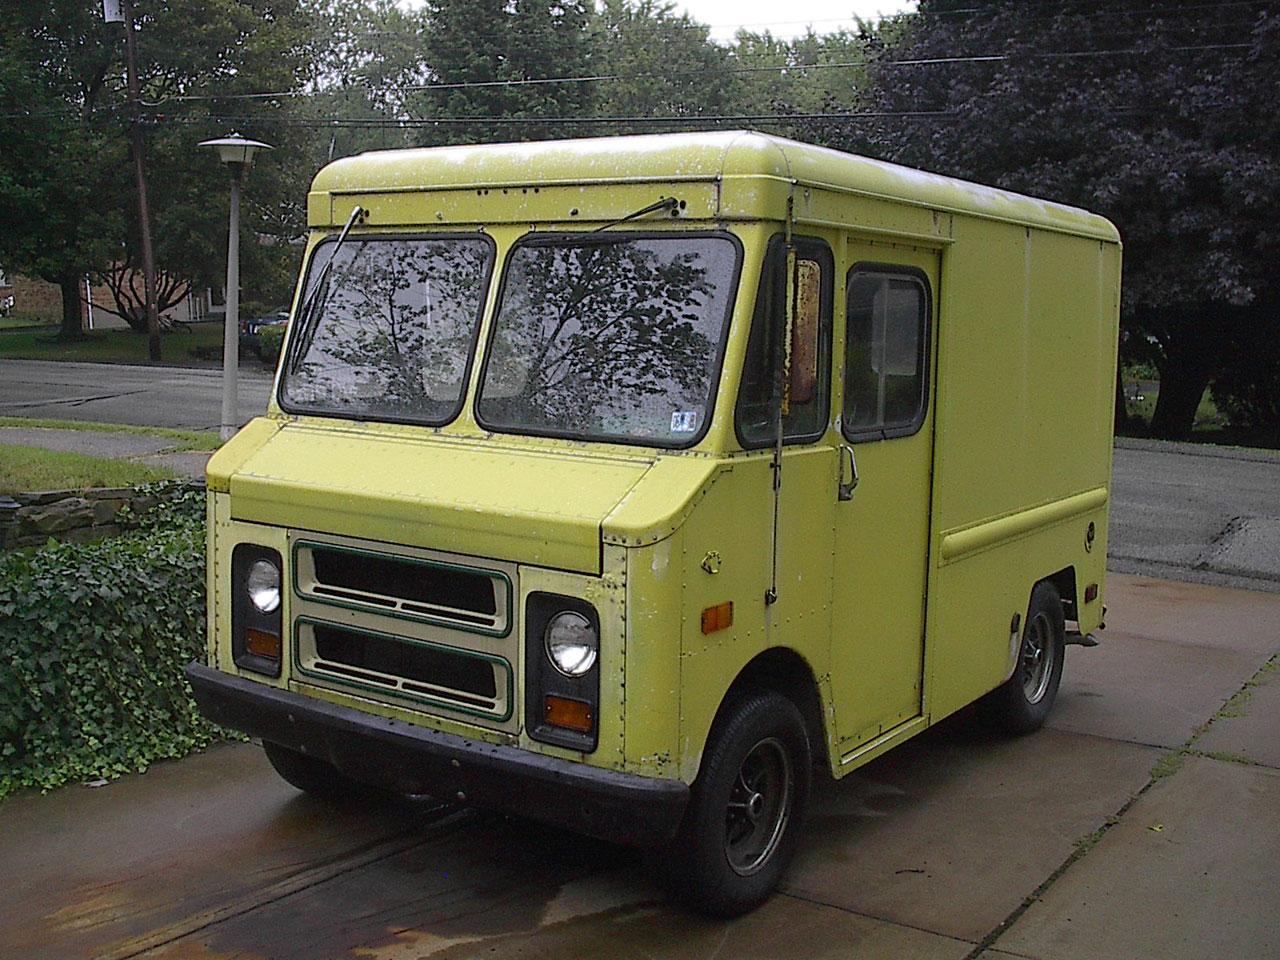 Chevrolet Step-Van 7 '69 (Commercial vehicles) - Trucksplanet